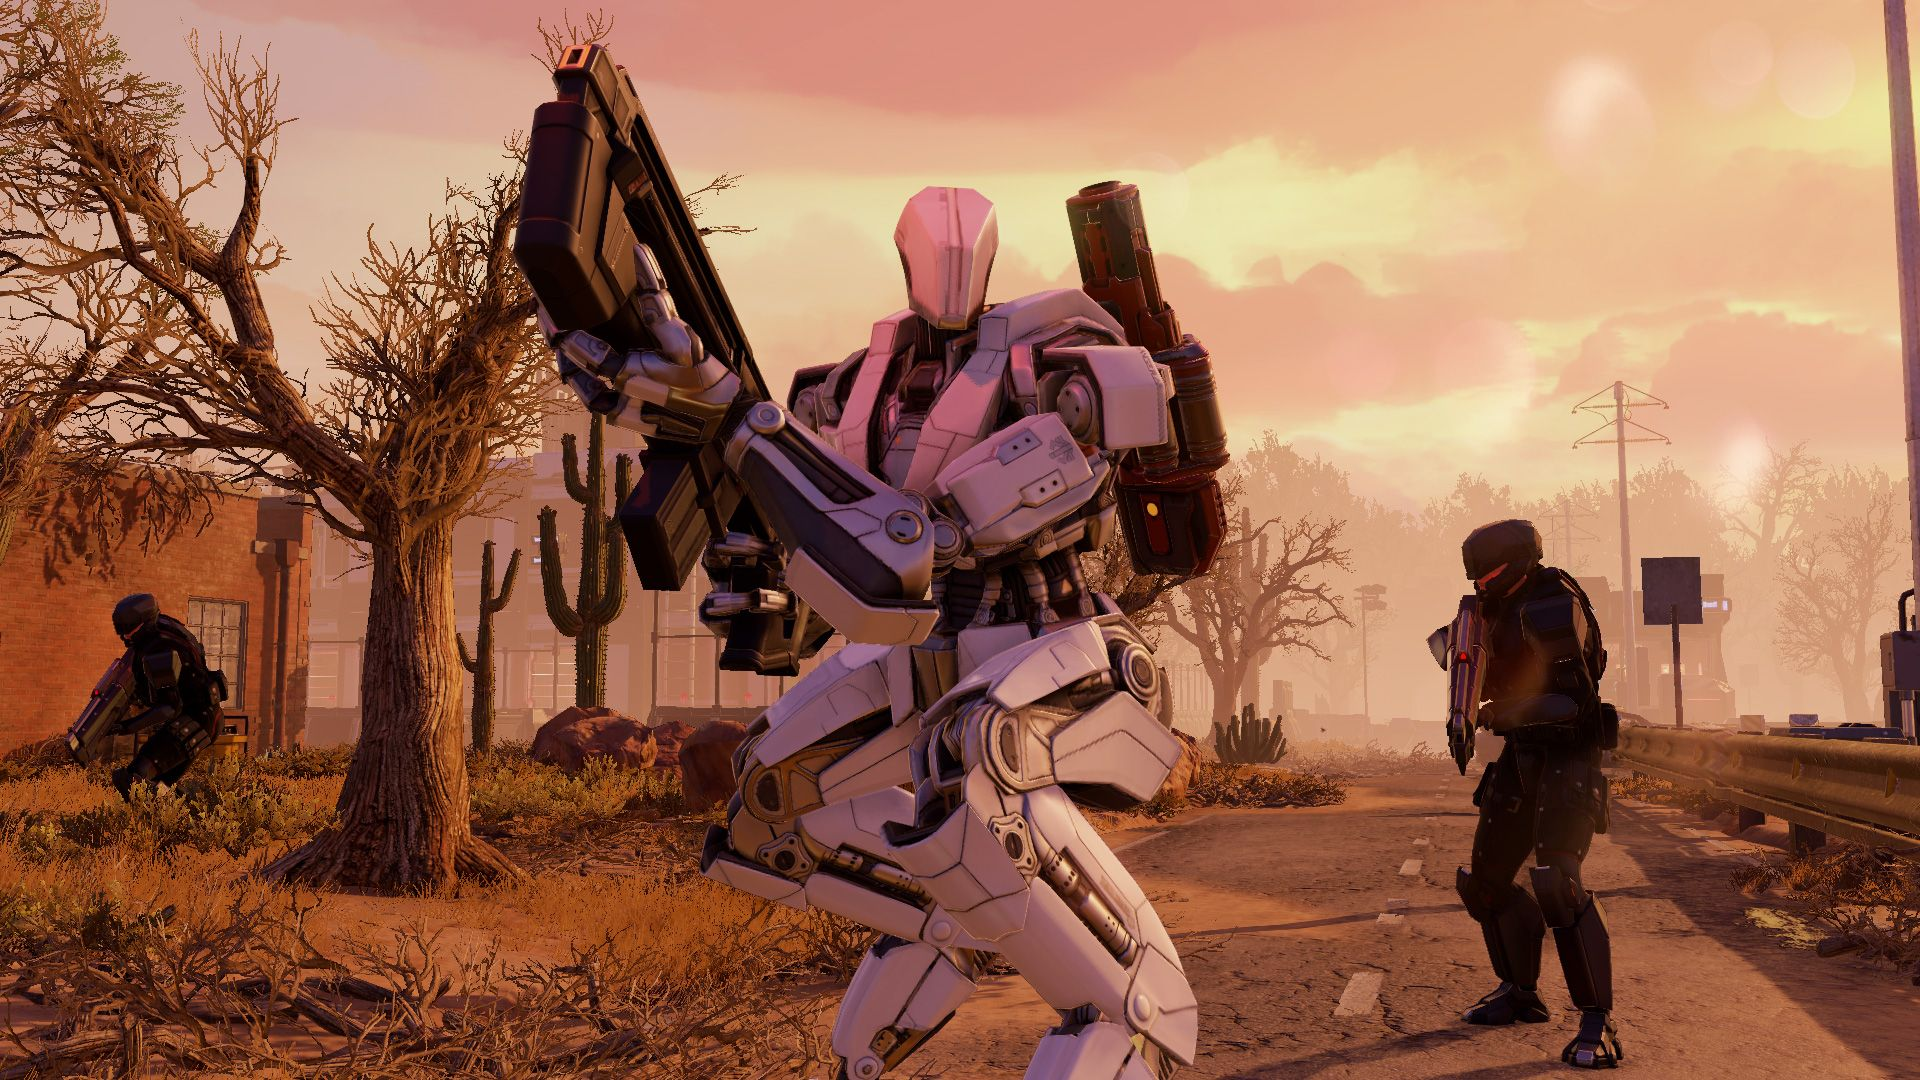 FR - XCOM 2: The Armored ADVENT MEC Presents a Heavy Threa